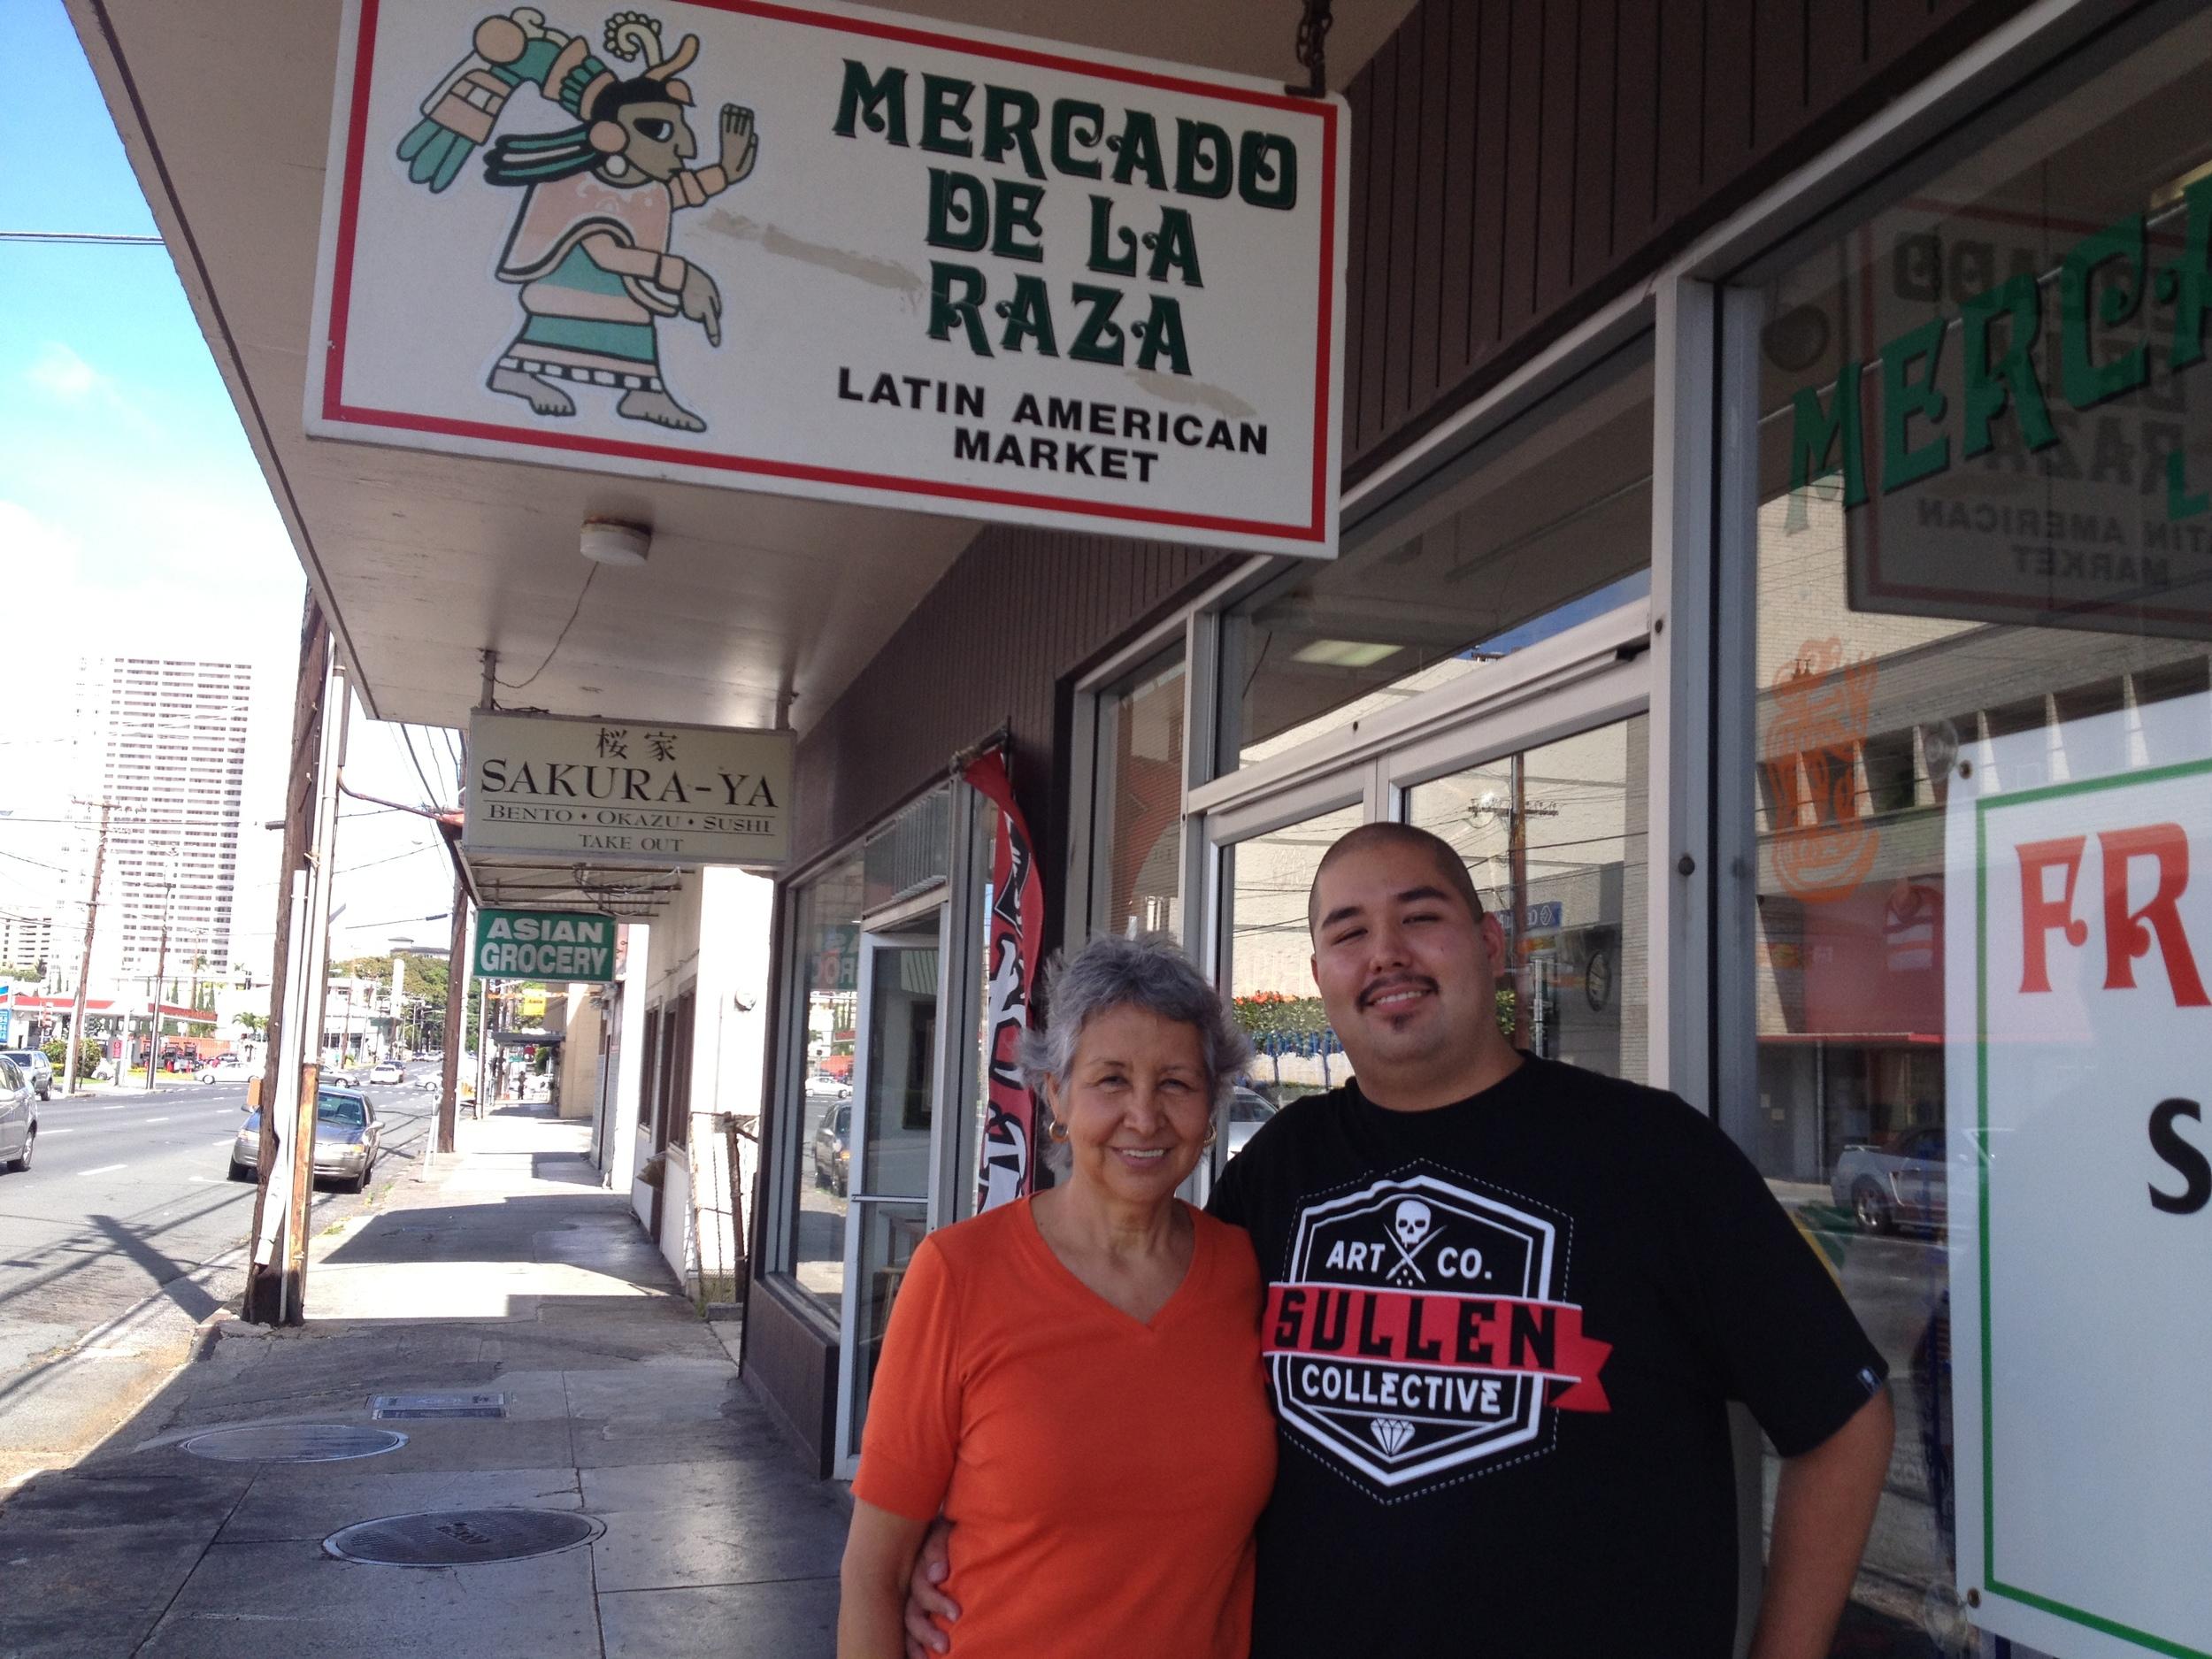 Marta Sanchez Romero (Mexican) and son Reynaldo Minn (Korean/Mexican). Owners, Mercado de la Raza. O'ahu.